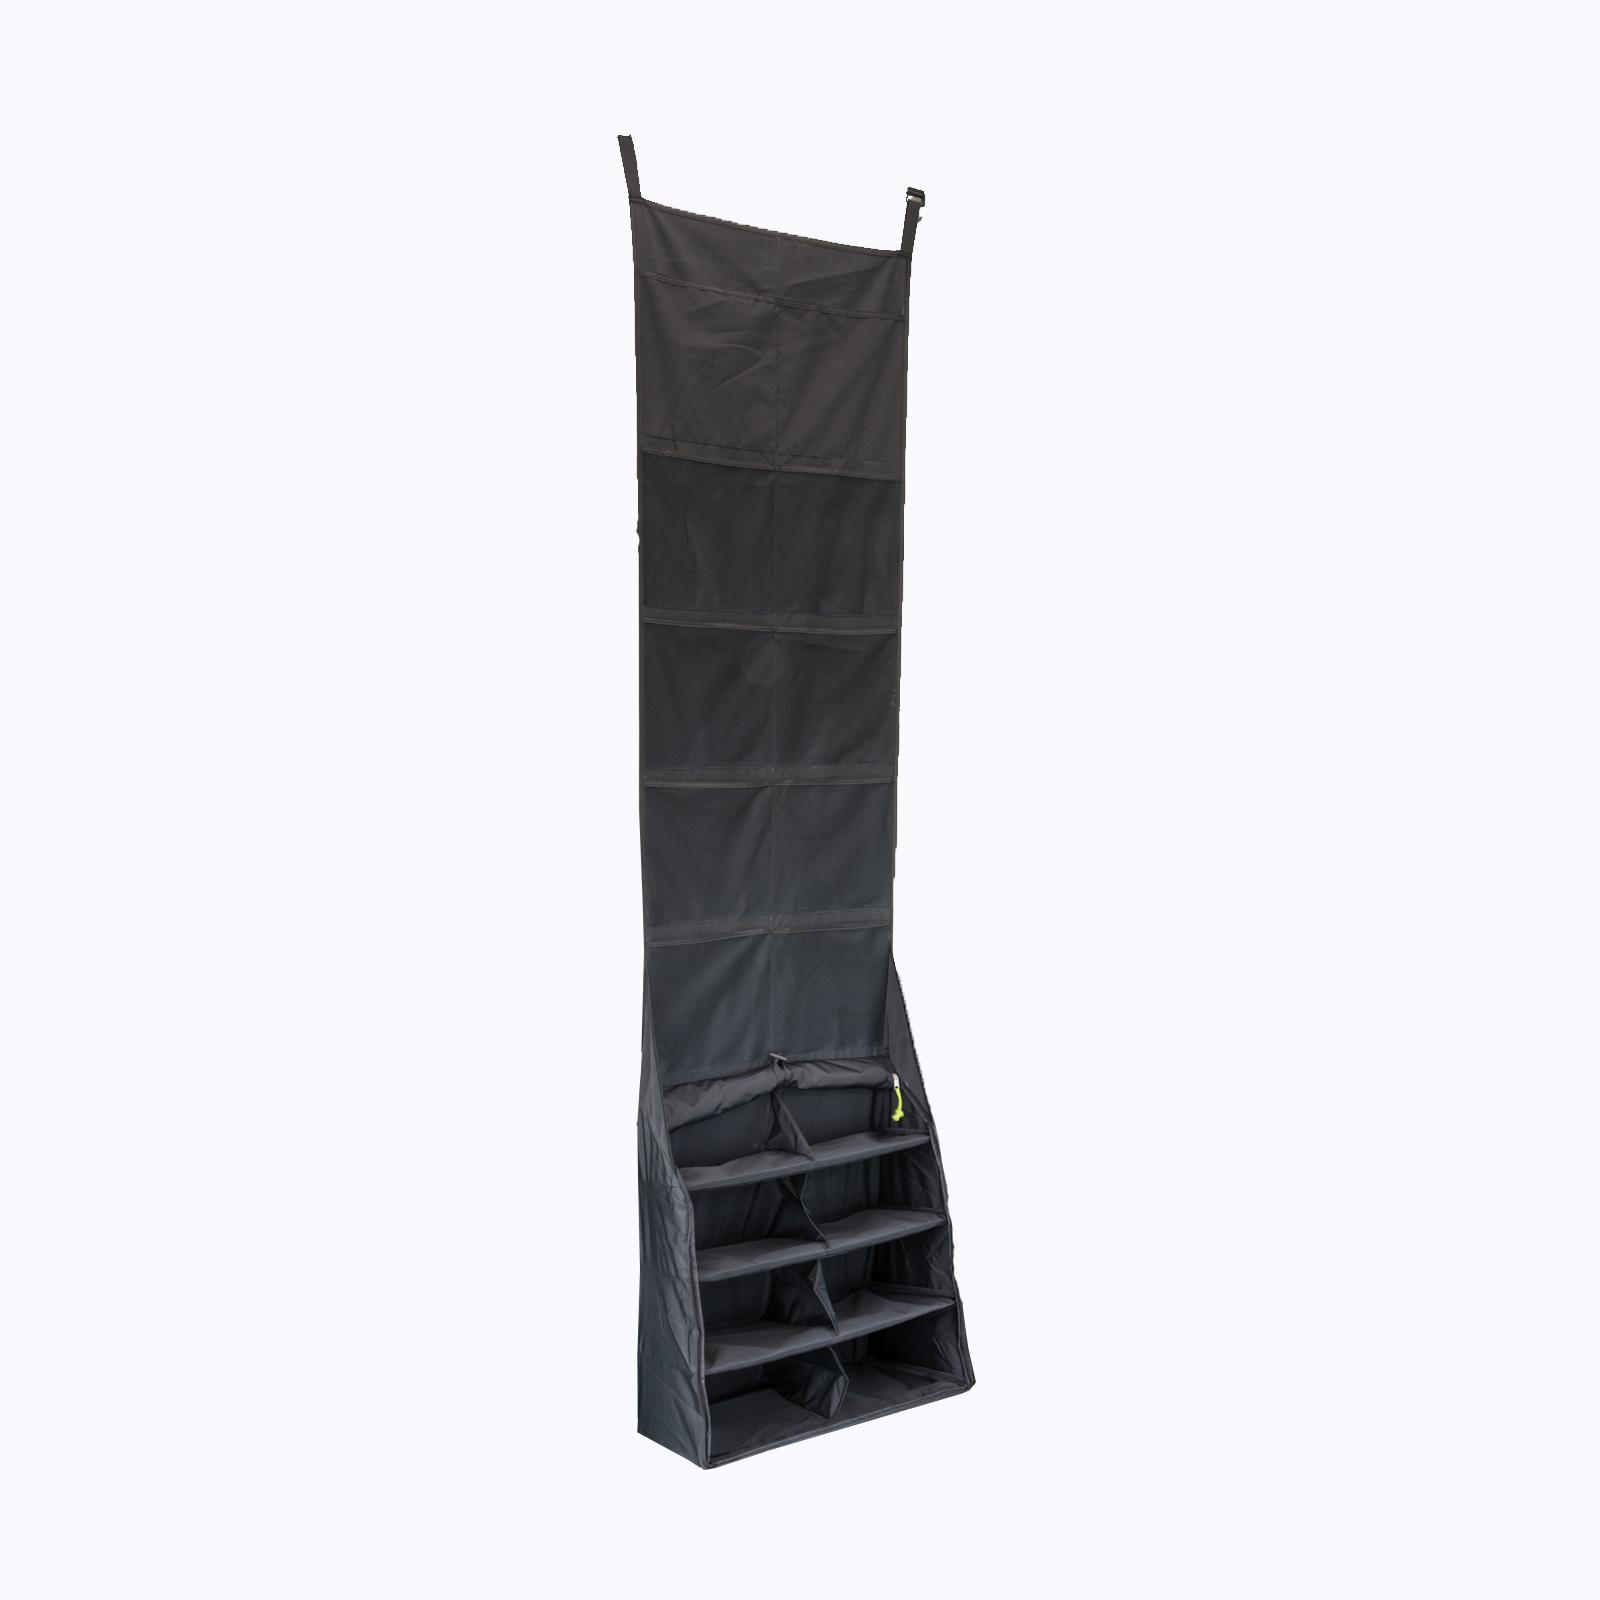 Rutenfutteral Rutenhülle Rutenschutz Rutentasche Futteral 162cm für Ang XHF